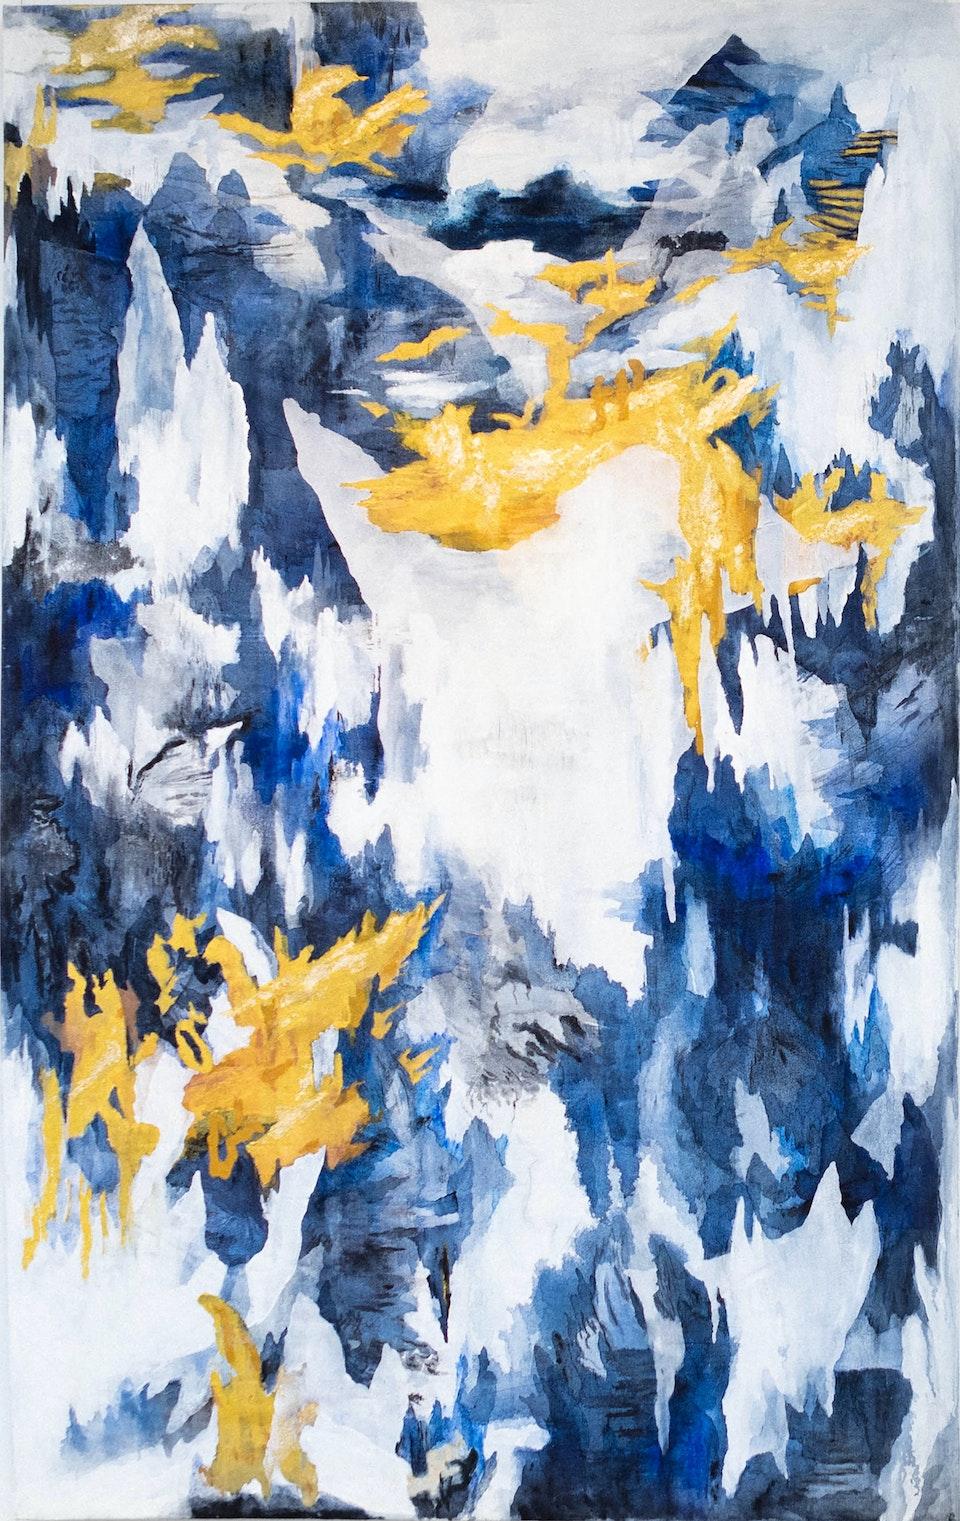 Devoiler_justinsouthey_2019_B - Justin Southey Dévoiler Acrylic & Gold Leaf on Canvas 1230 x 1960 mm 2019 ZAR 57 000